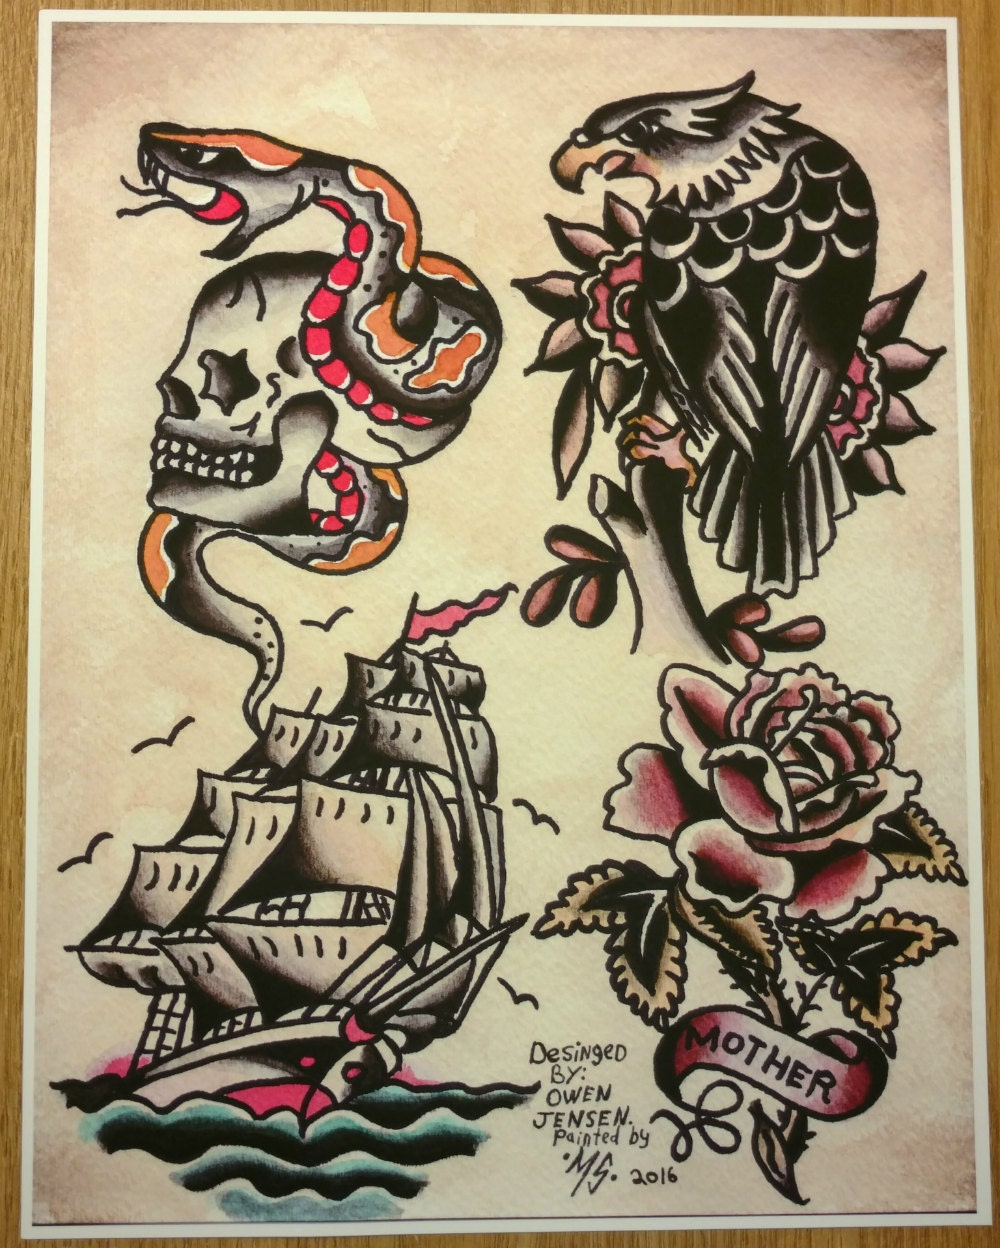 American Traditional Skull And Eagle: Owen Jensen Classic Tattoo Flash Print. Tattoo Flash Recreated